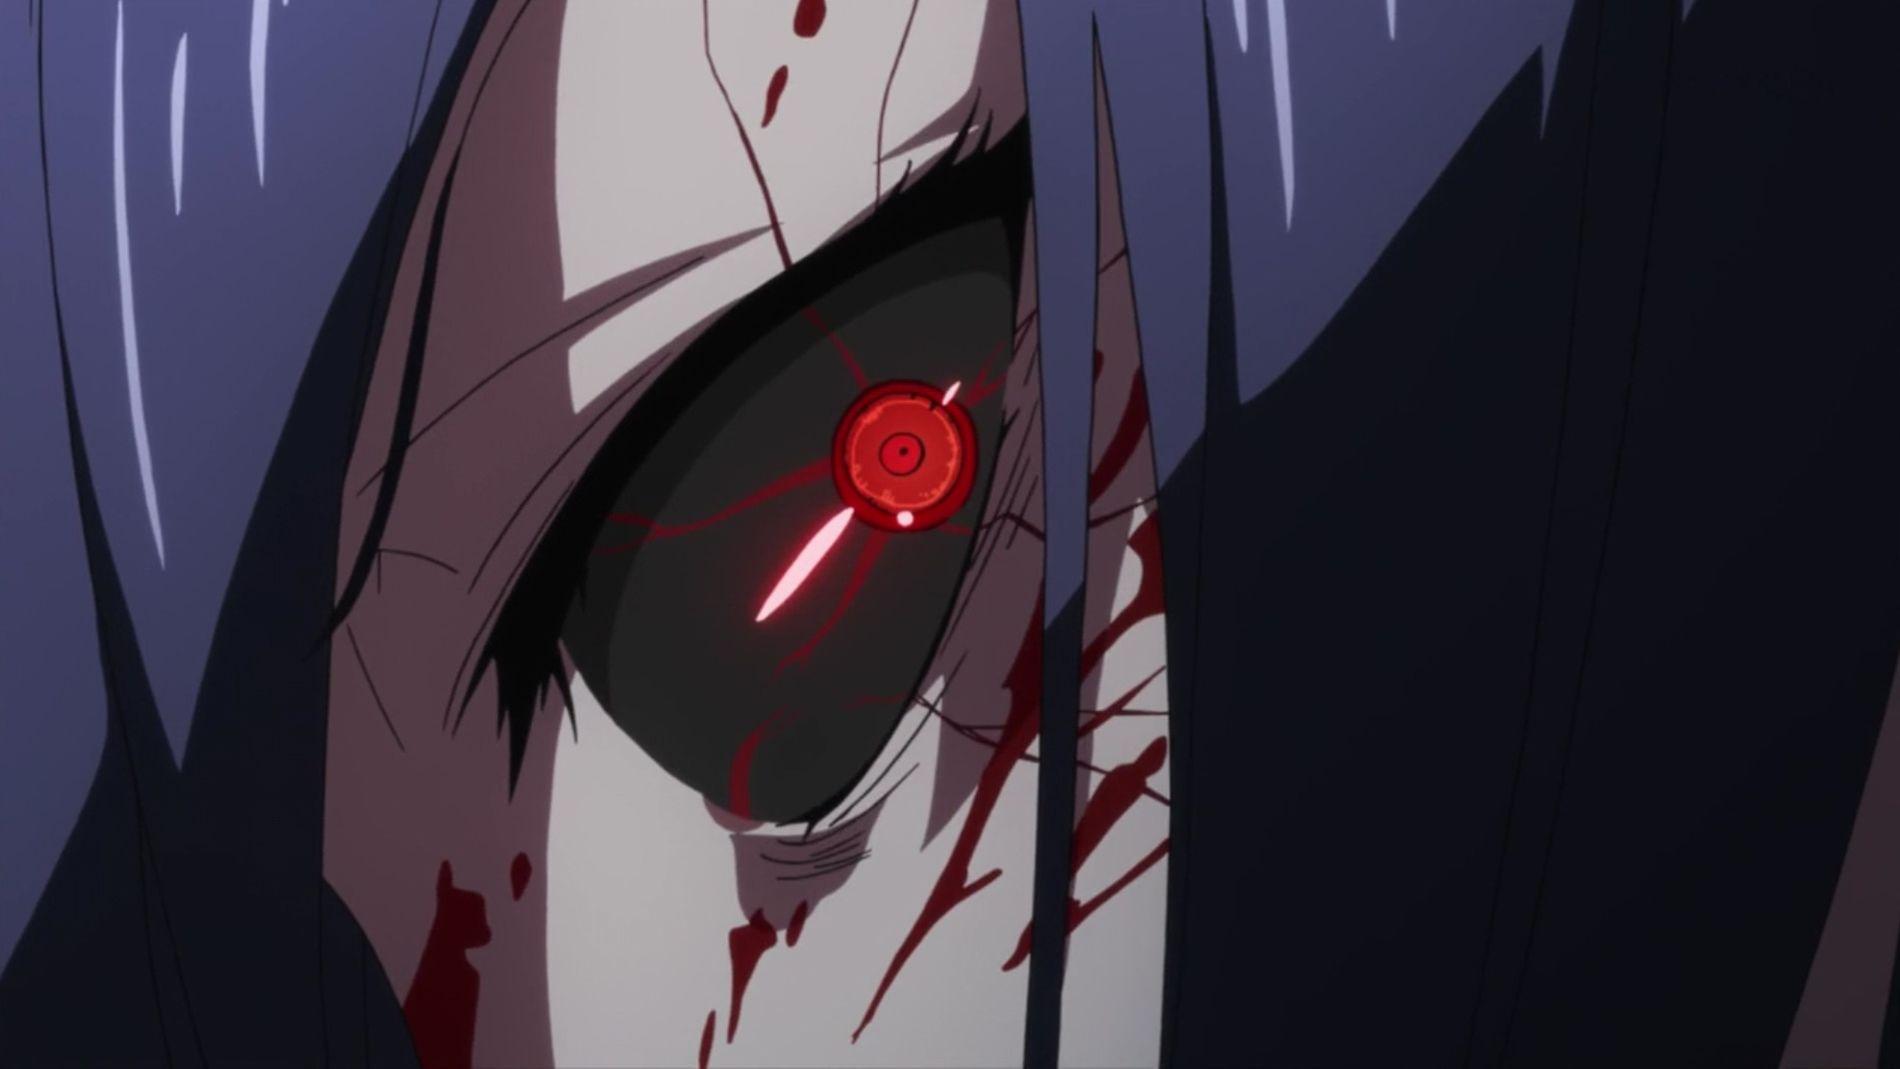 Tokyo ghoul anime freak 7 hd wallpaper